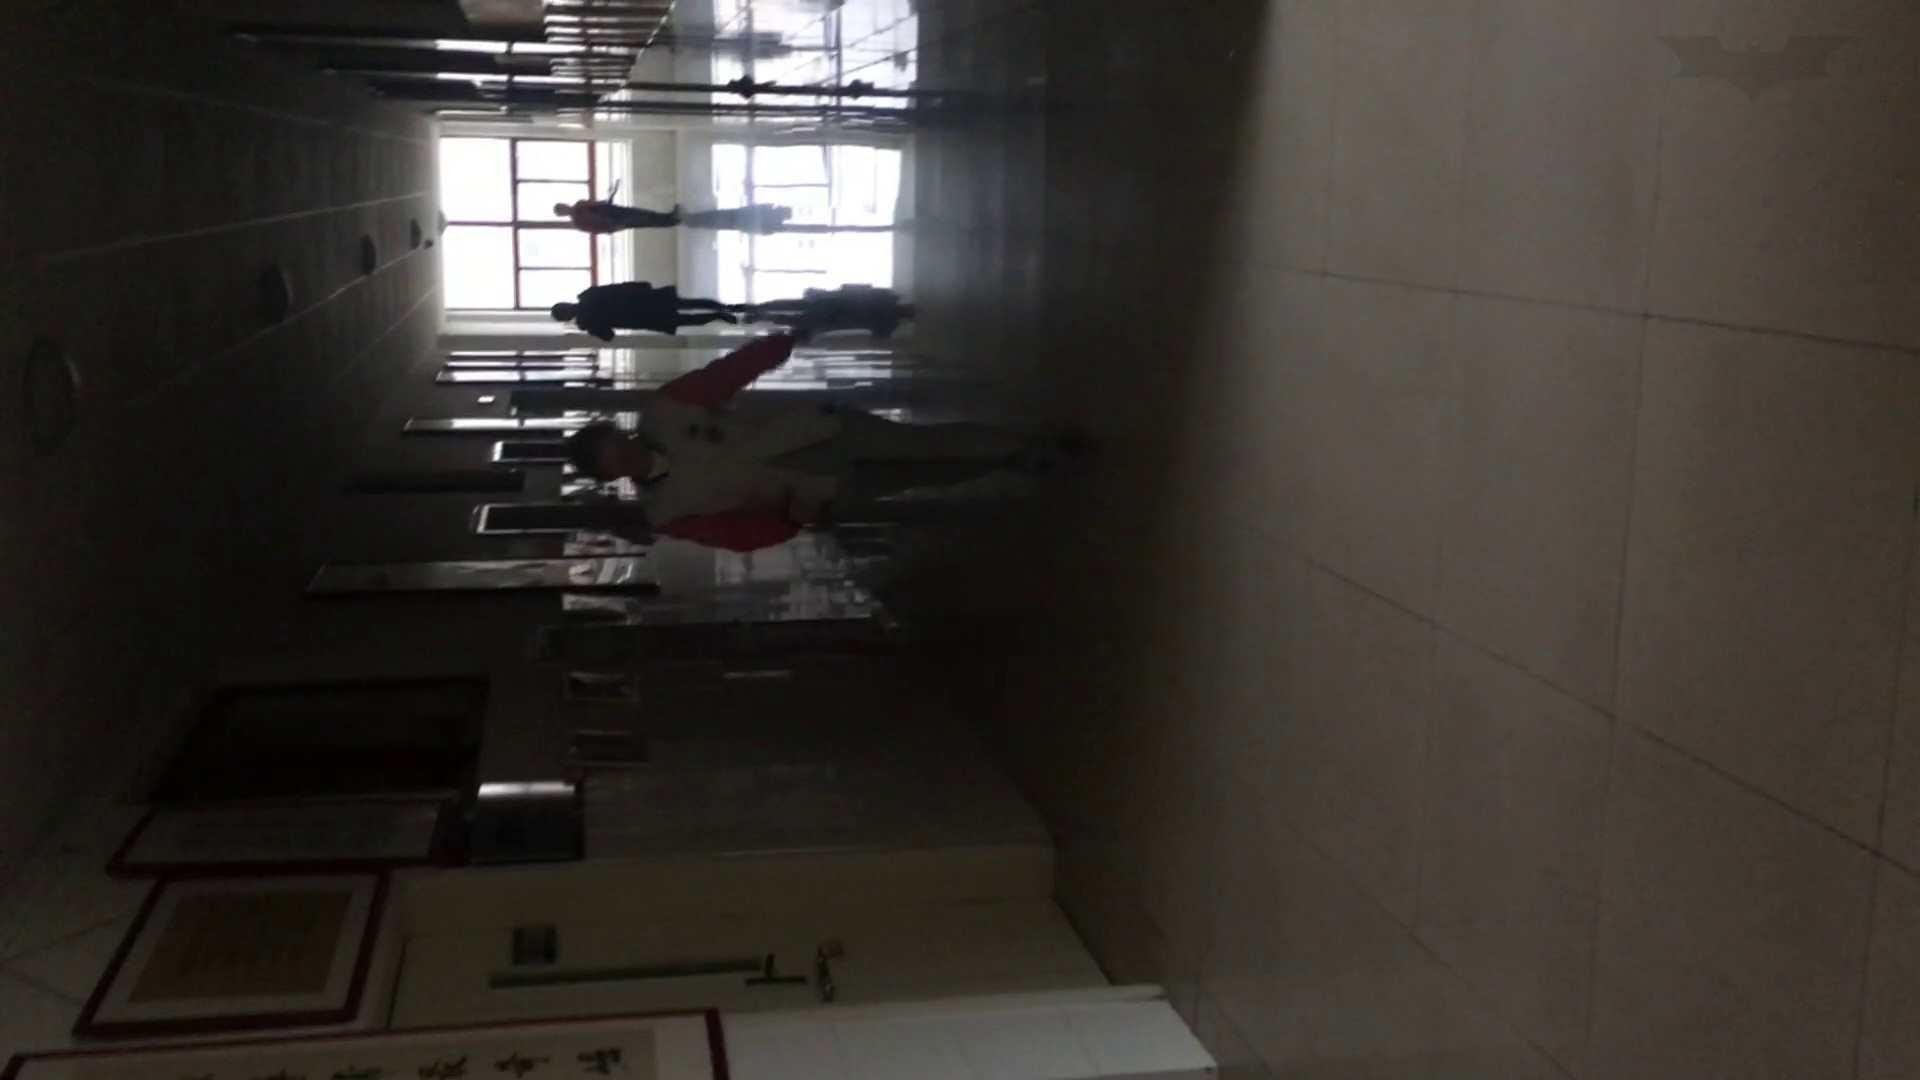 芸術大学ガチ潜入盗撮 JD盗撮 美女の洗面所の秘密 Vol.80 盛合せ  79PIX 66